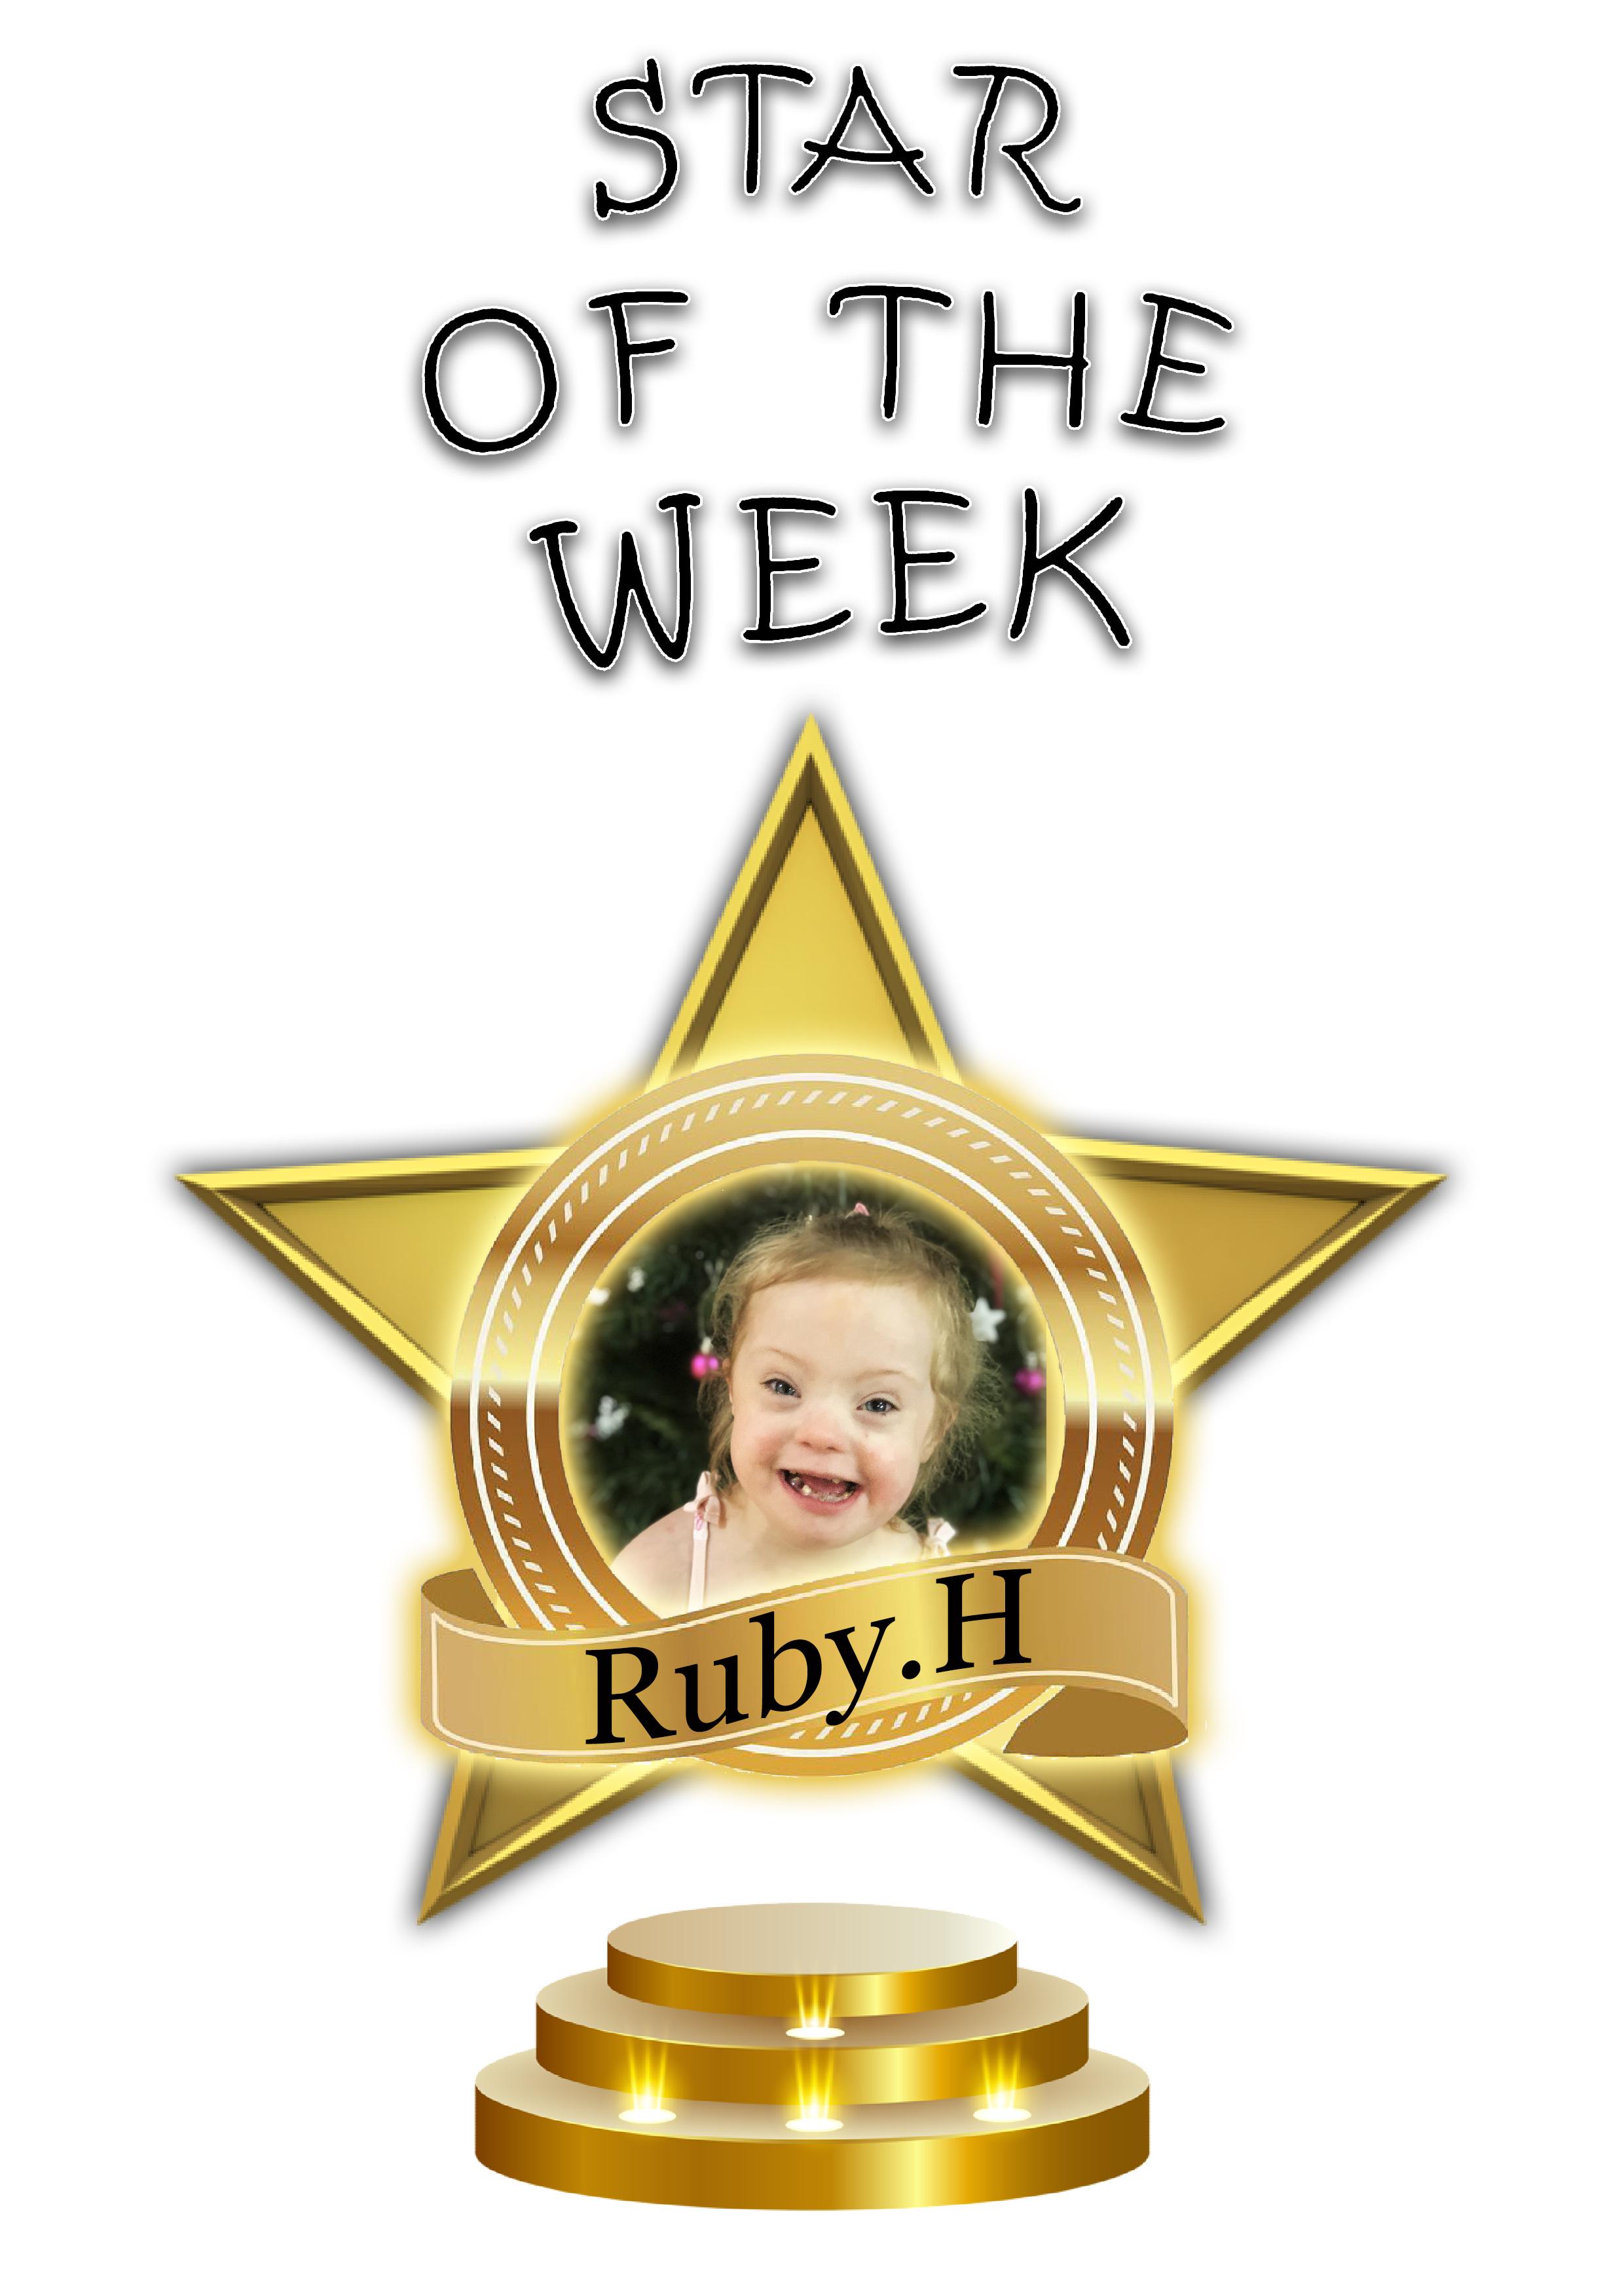 Ruby H